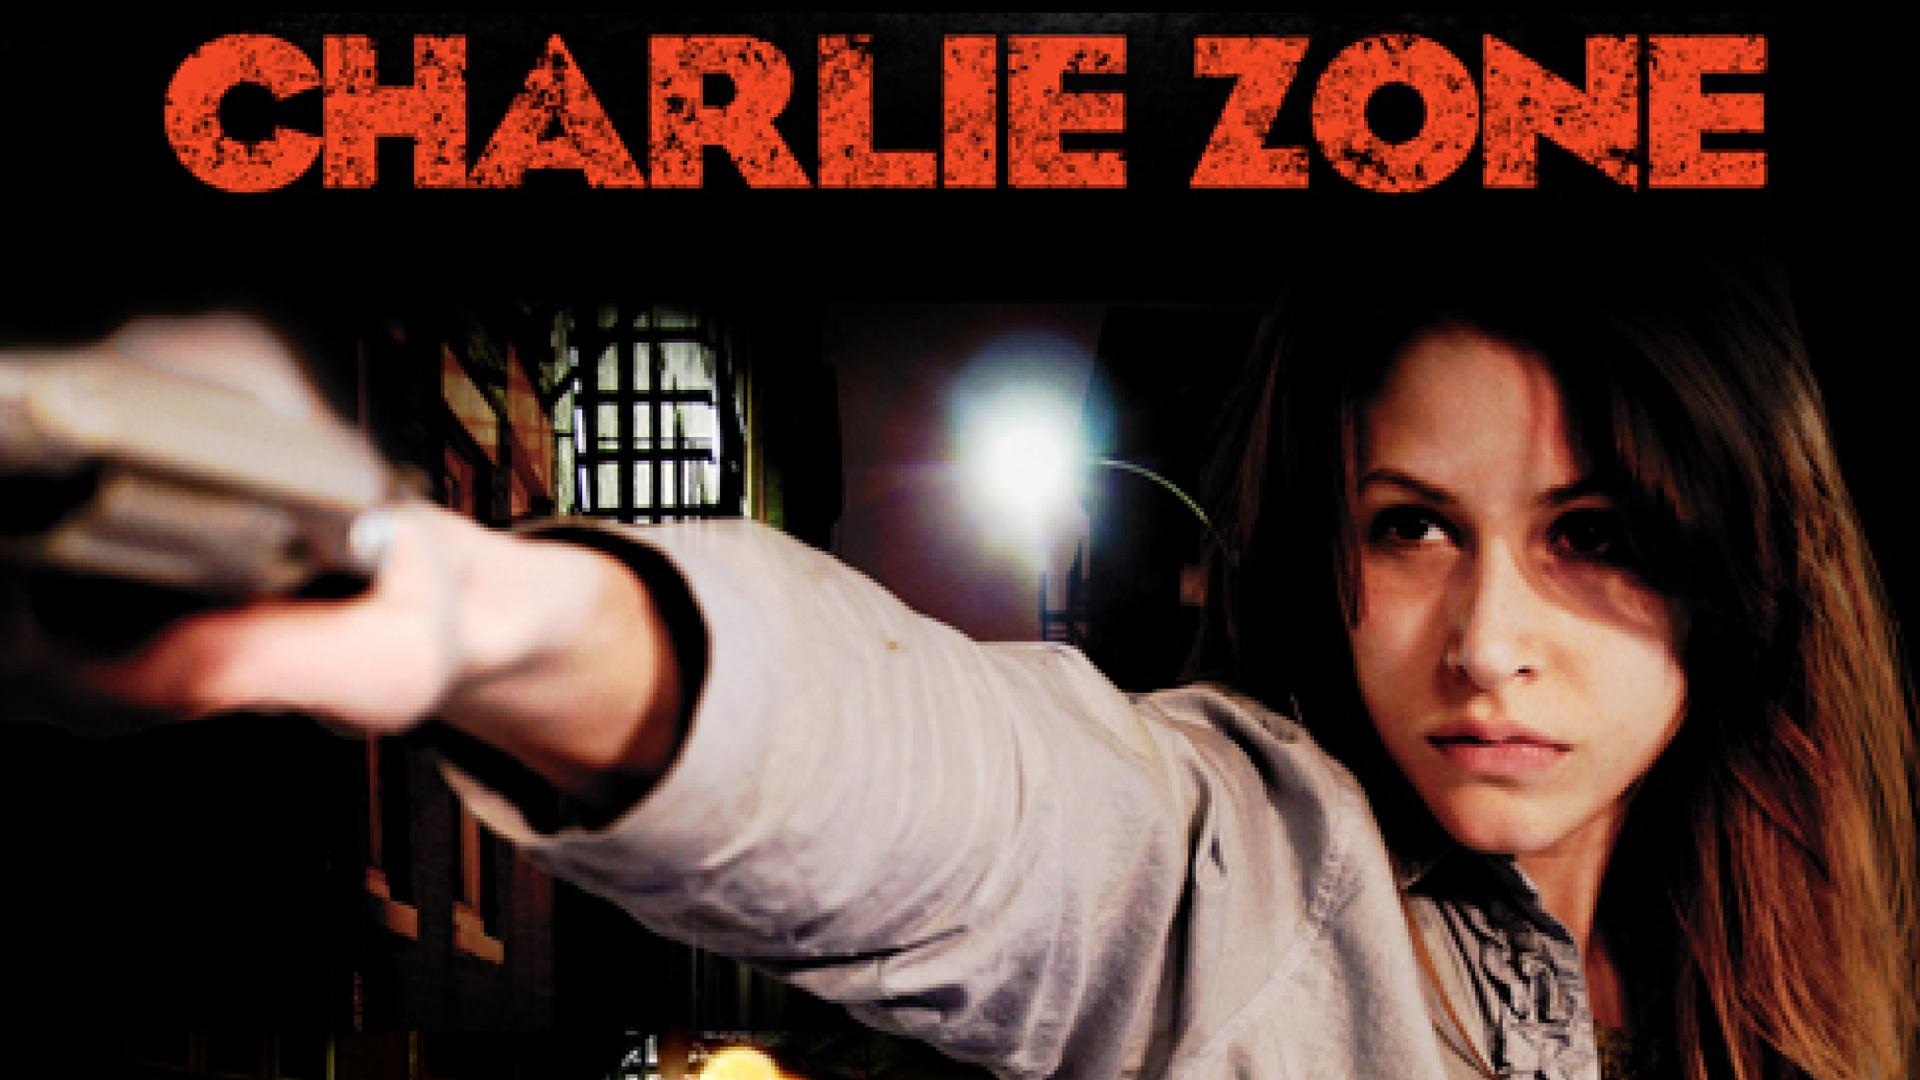 Charlie Zone